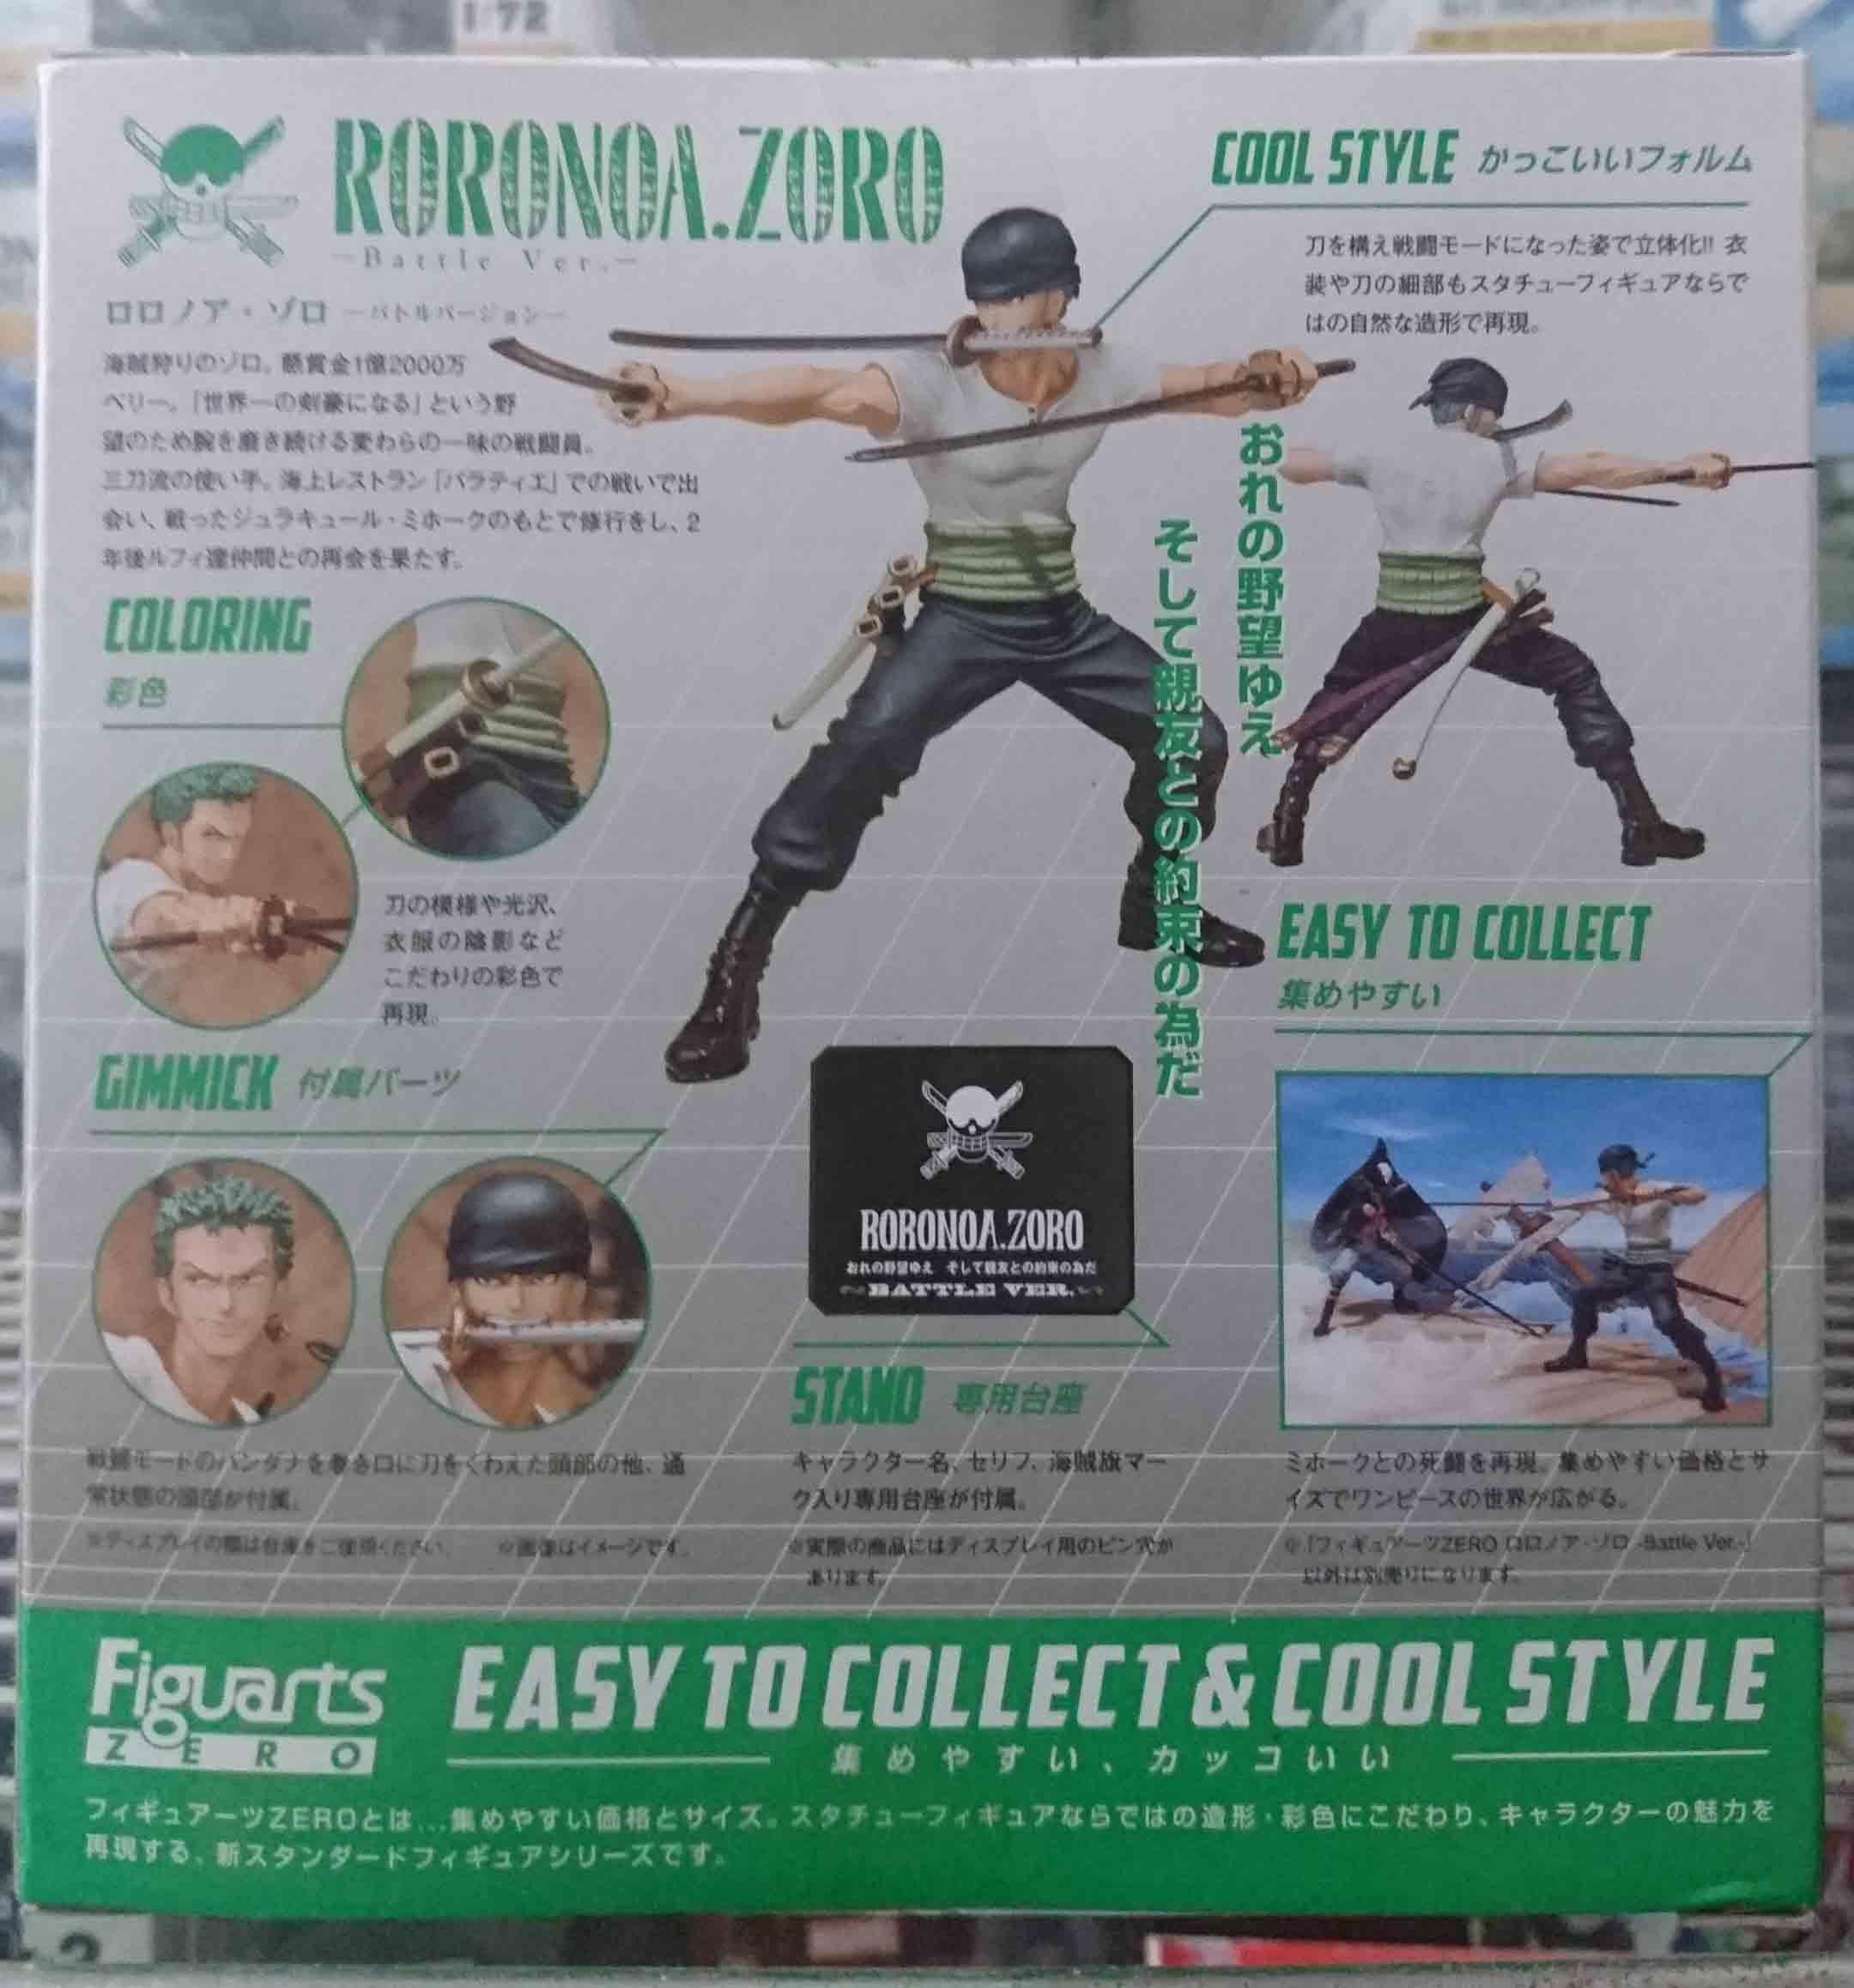 Figuarts Zero 羅羅亞 索隆 對戰版 Battle Ver.,益祥模型玩具外盒實拍照片。